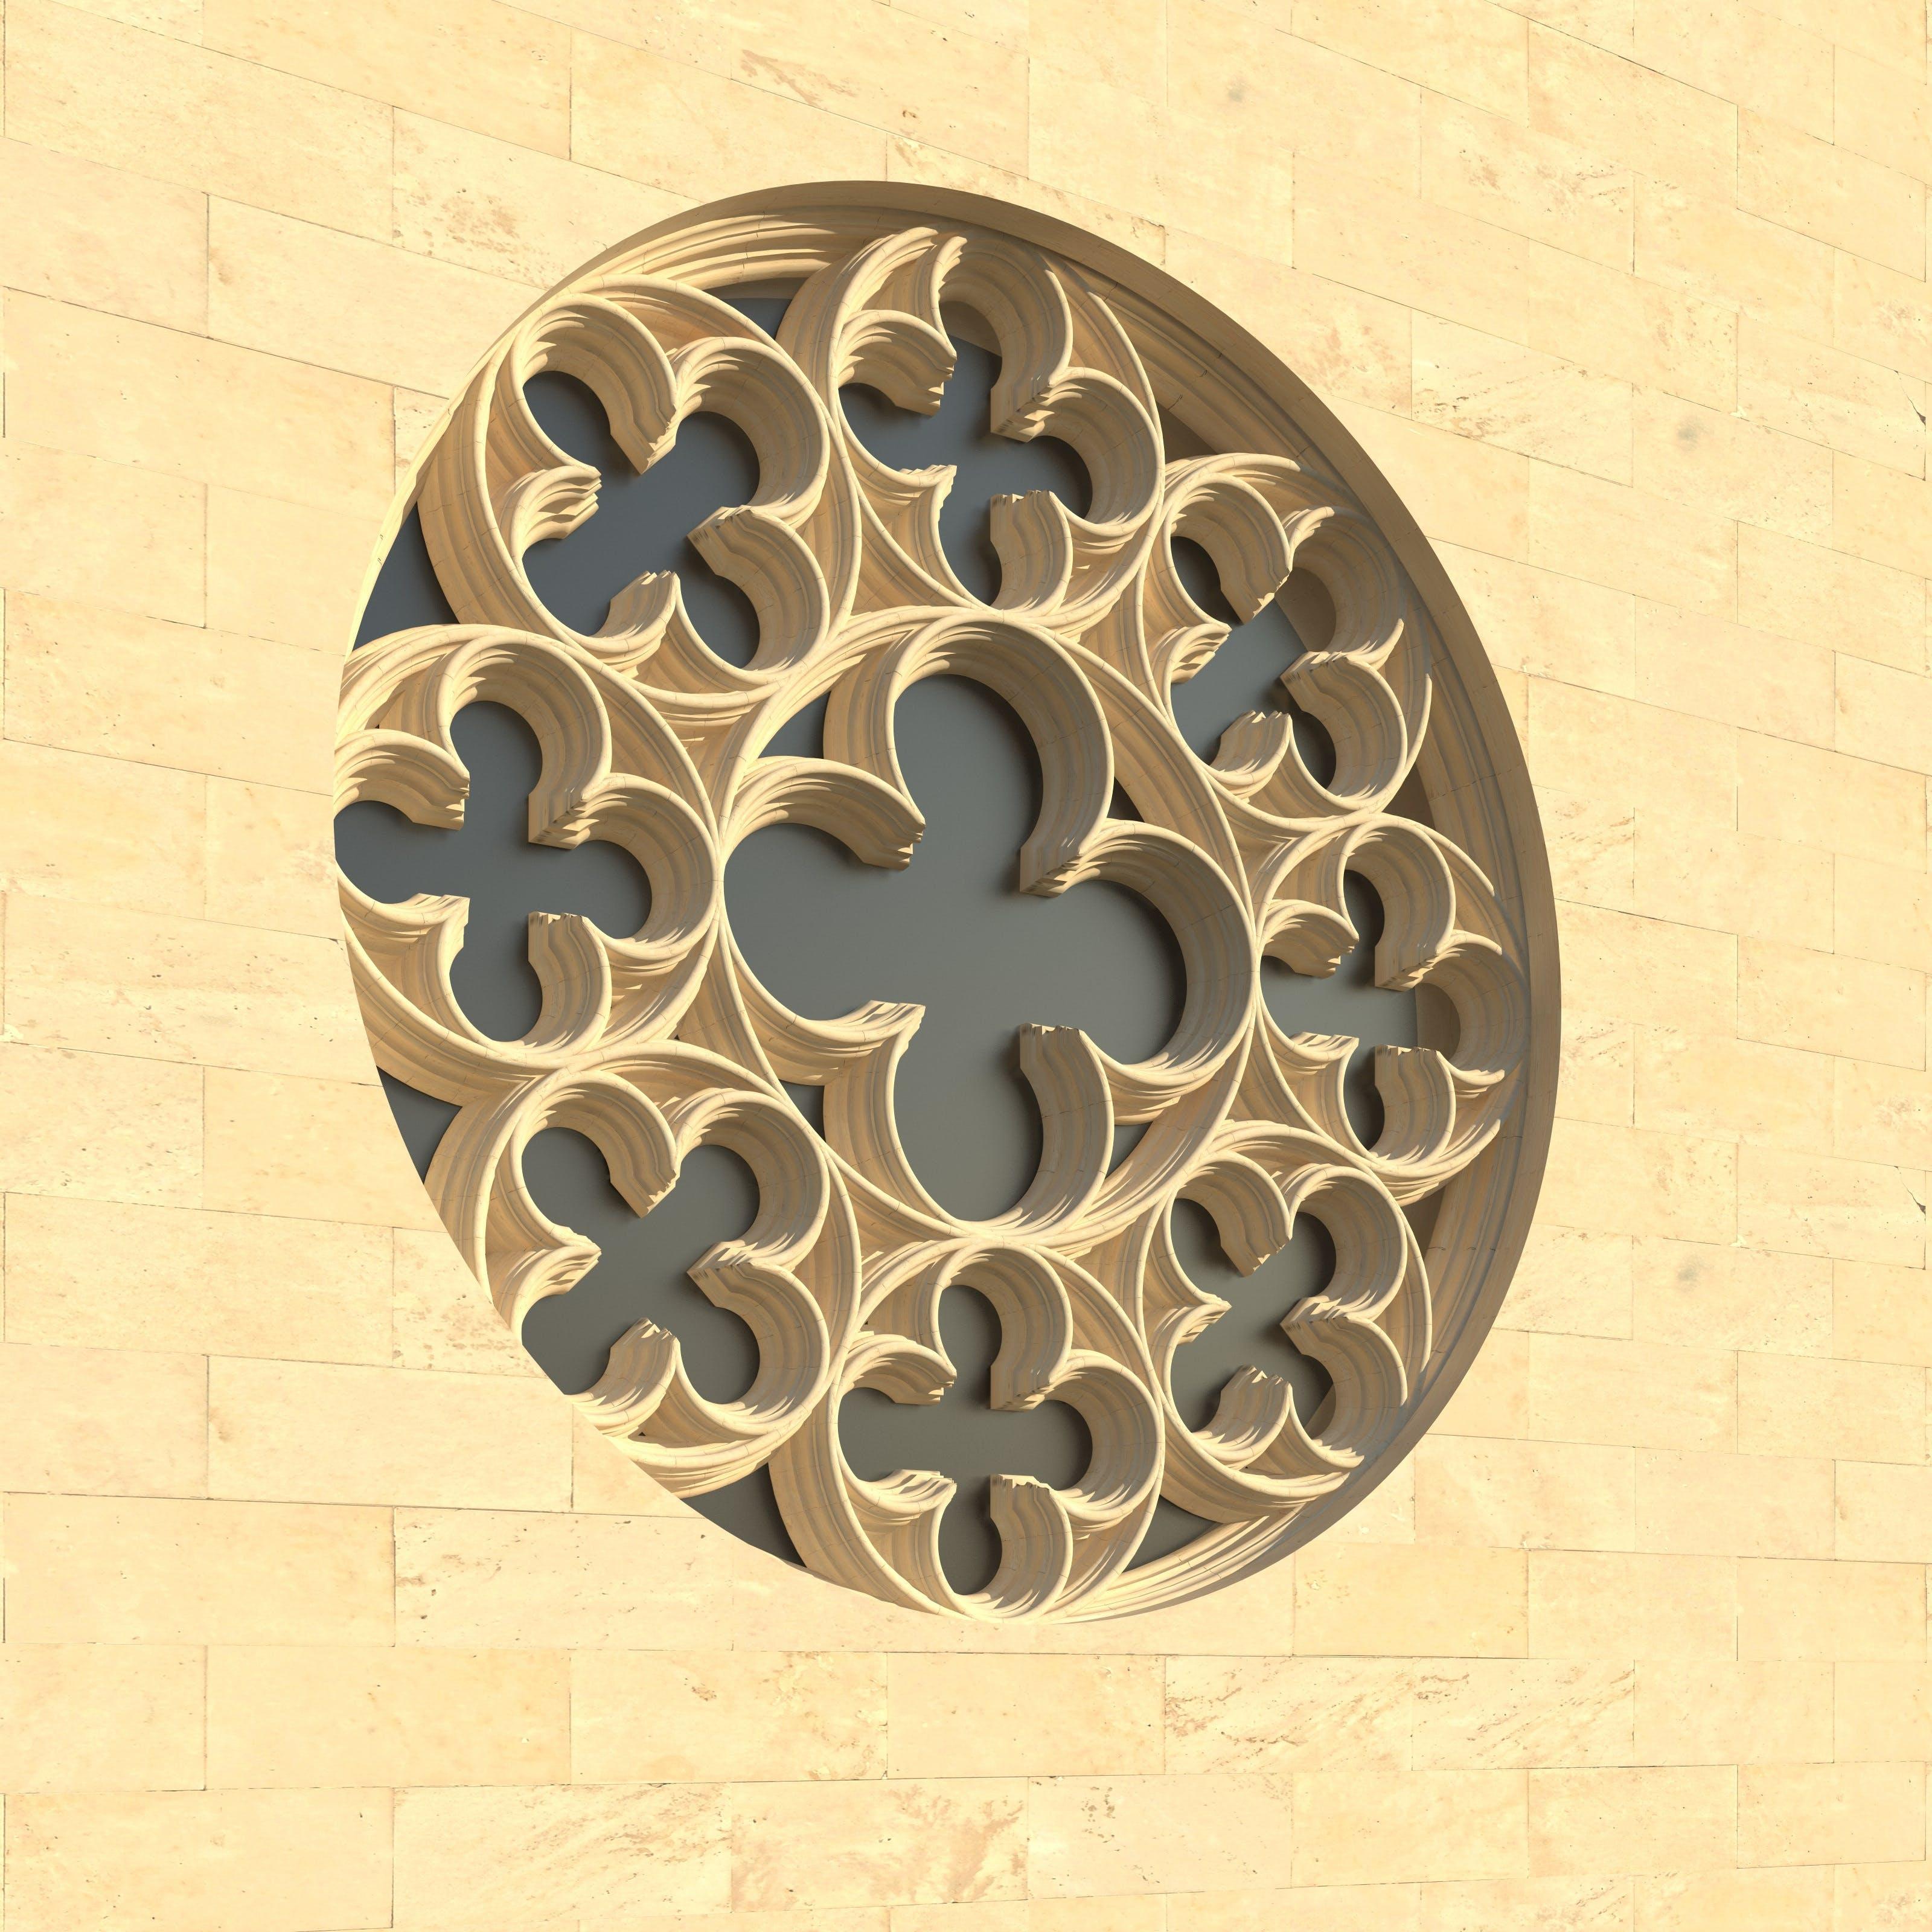 Free stock photo of architecture, window, church window, rosette